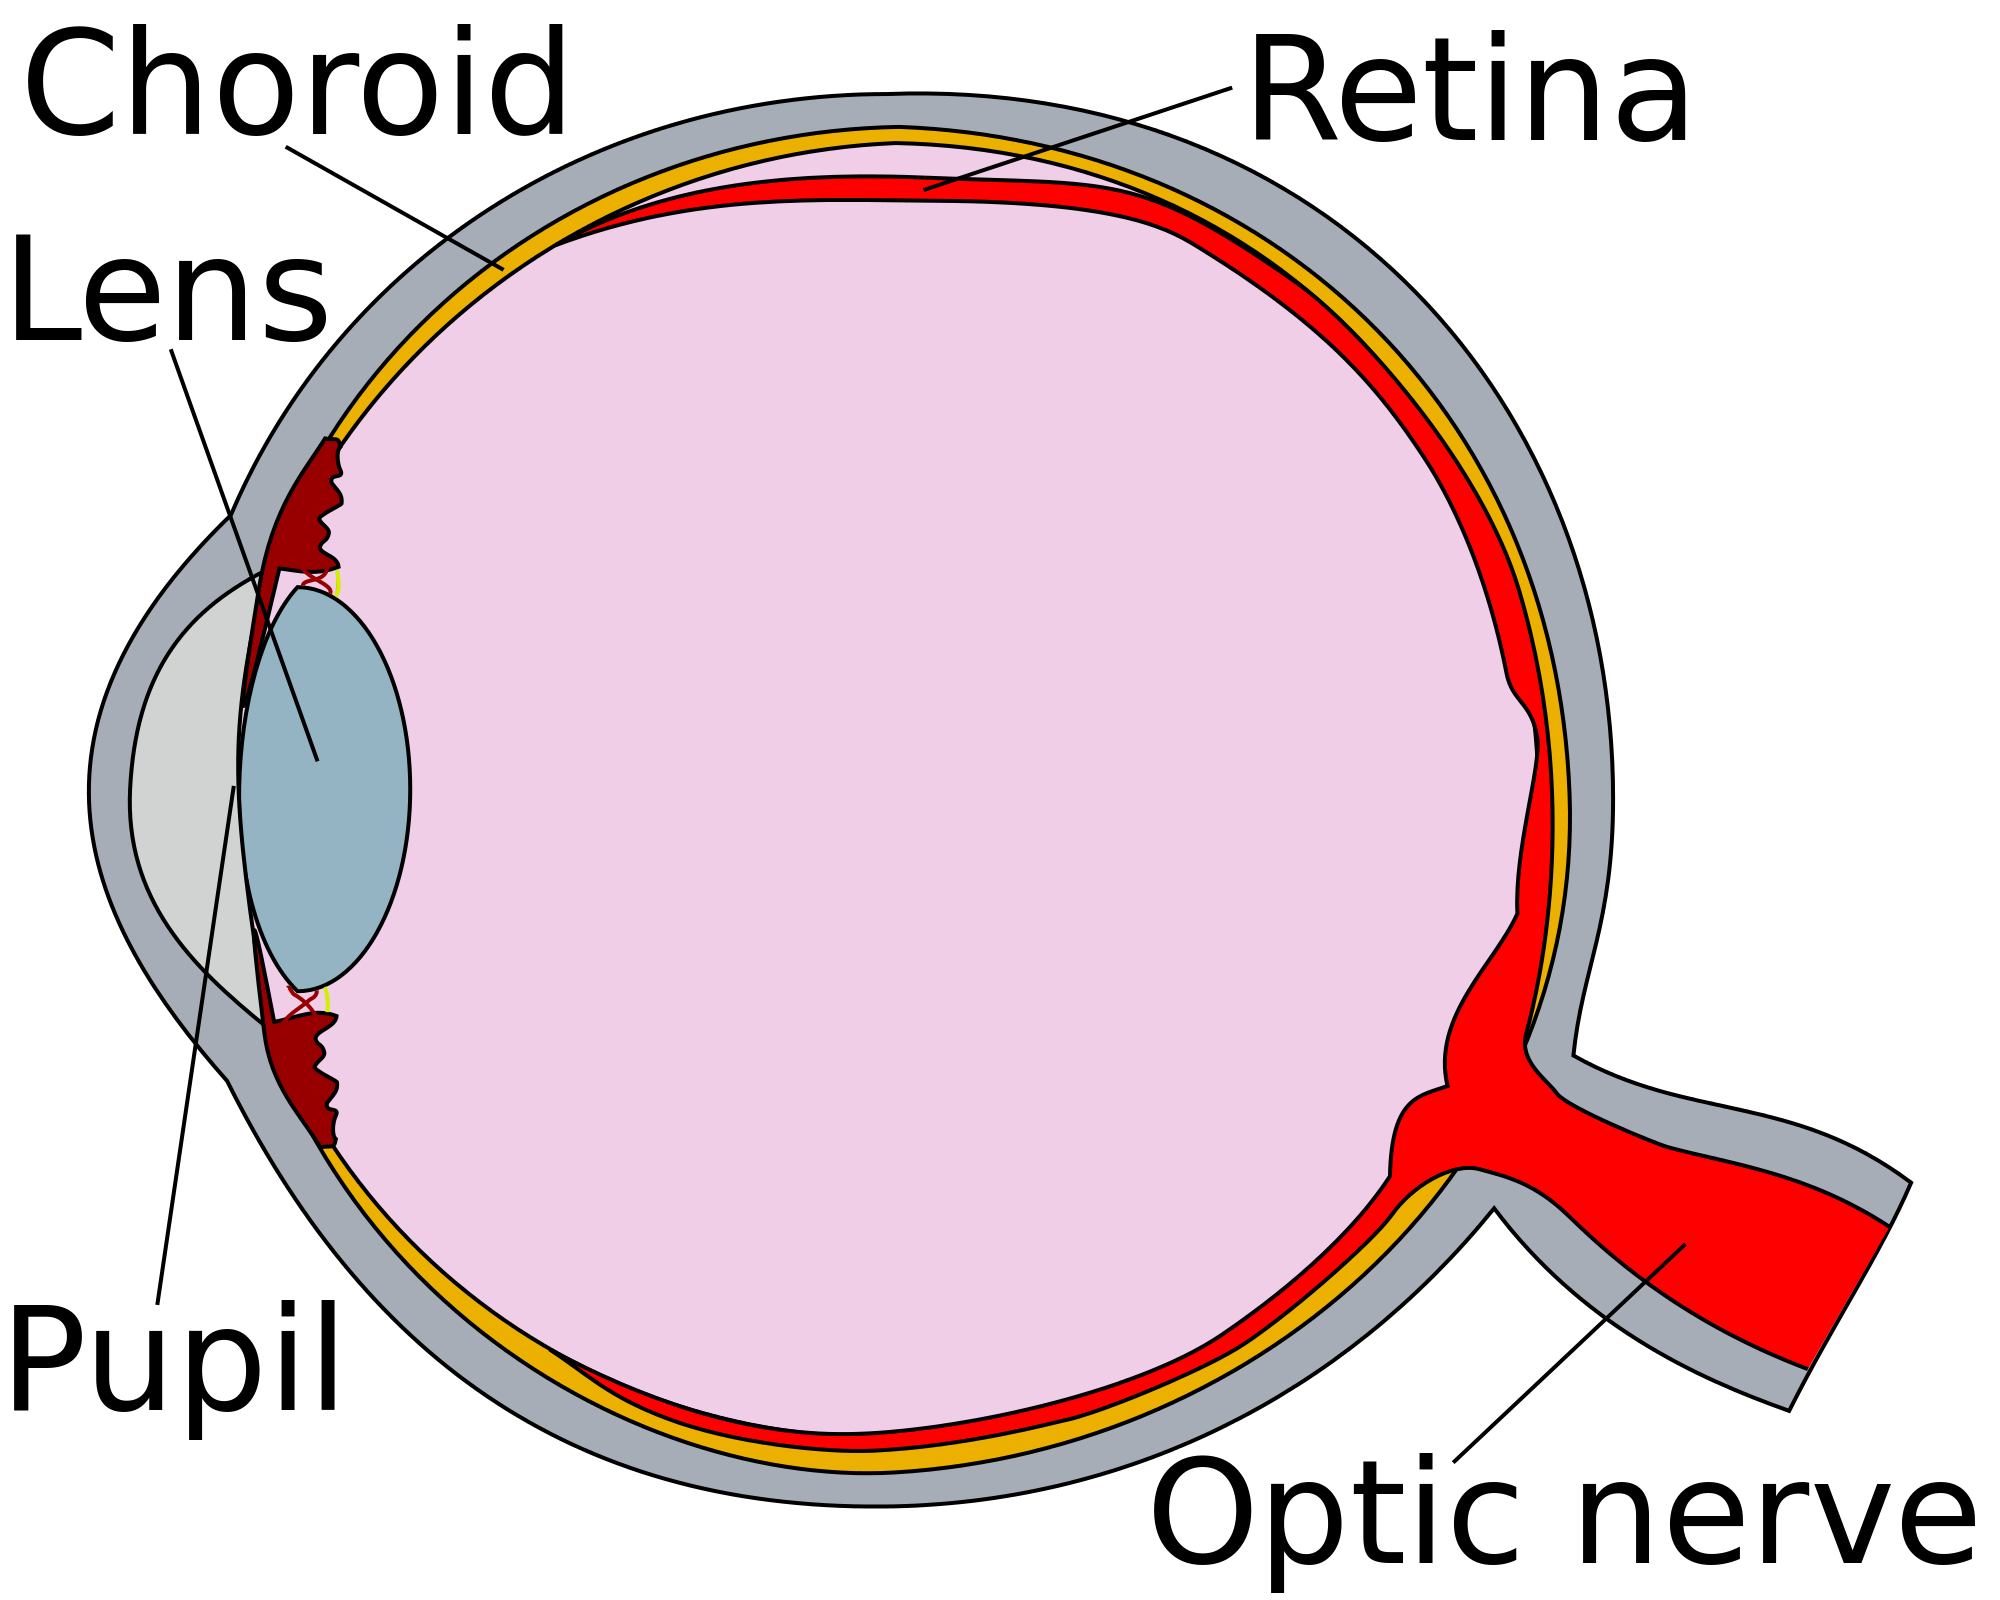 Eye clipart human eye. File cross section detached